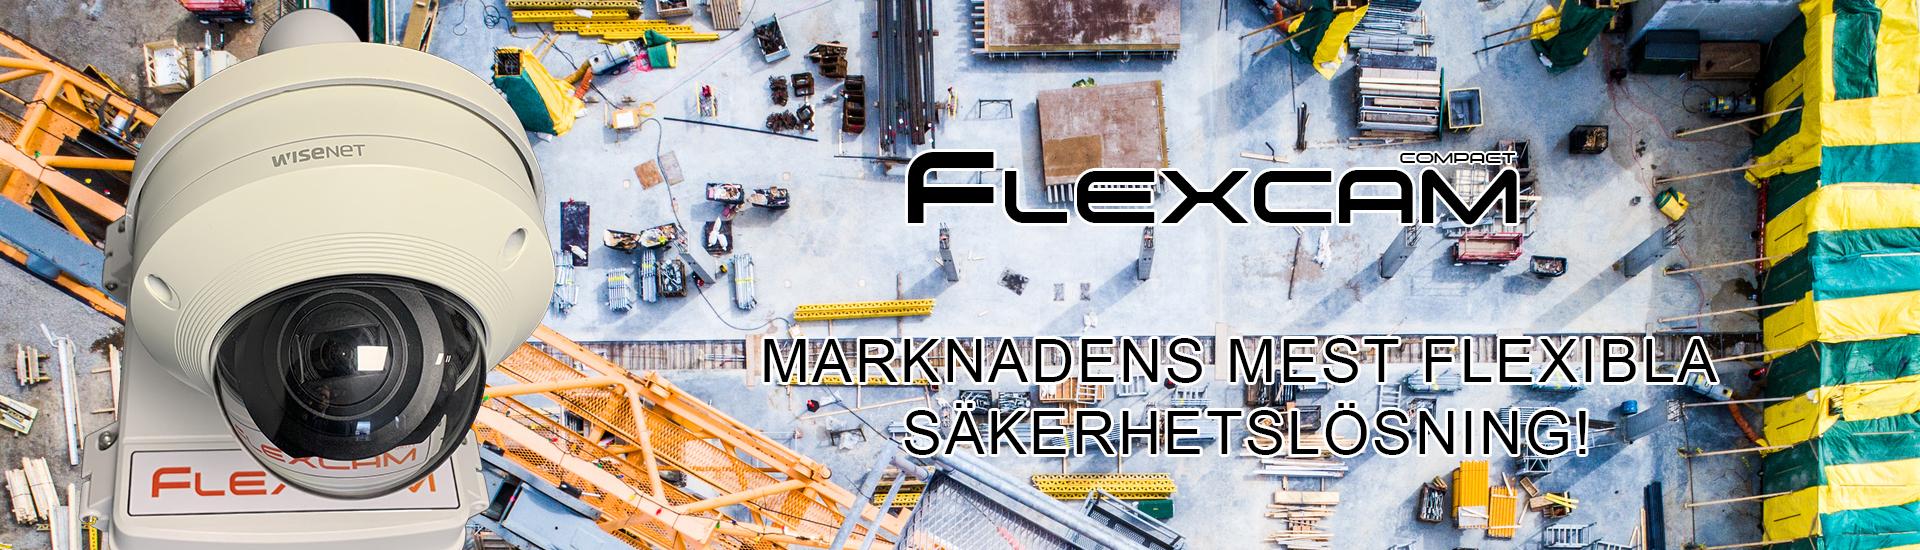 flex_comp_text